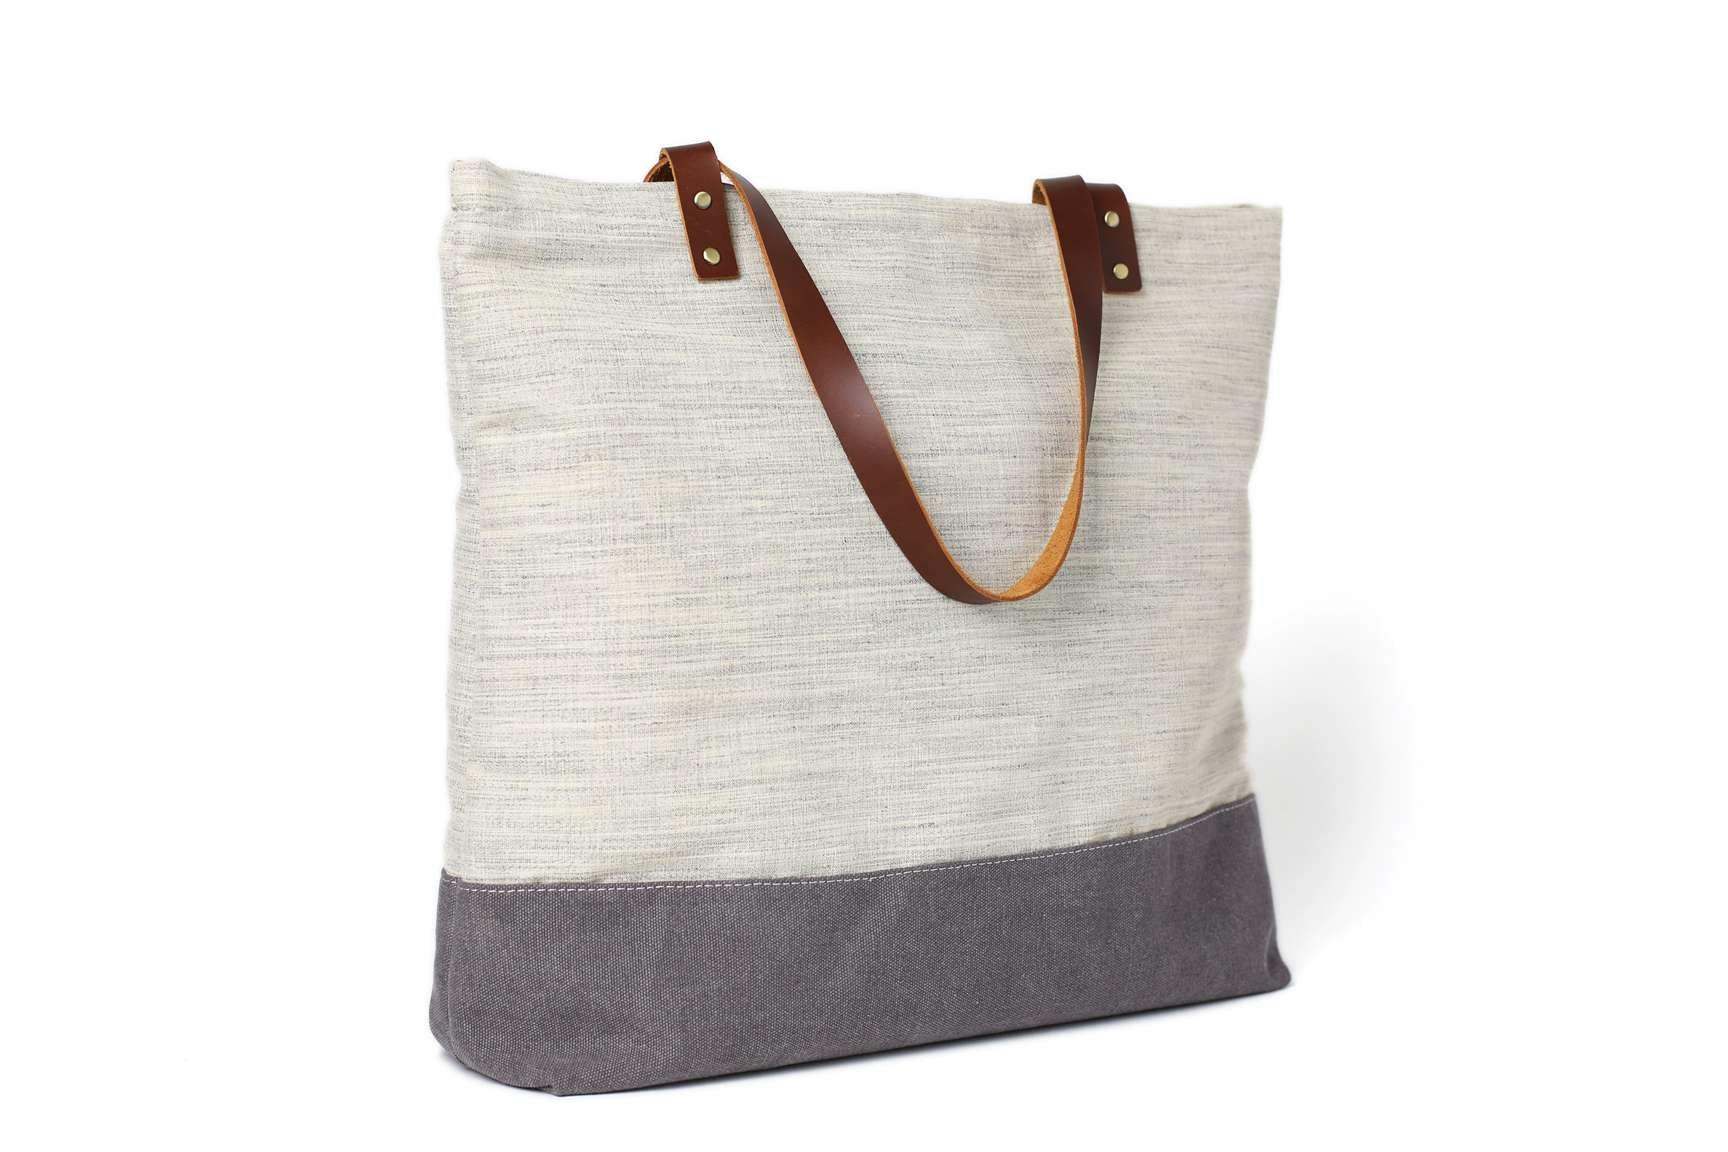 Handmade Canvas Tote Bags, Women Shoulder Bags, College Handbags 14040